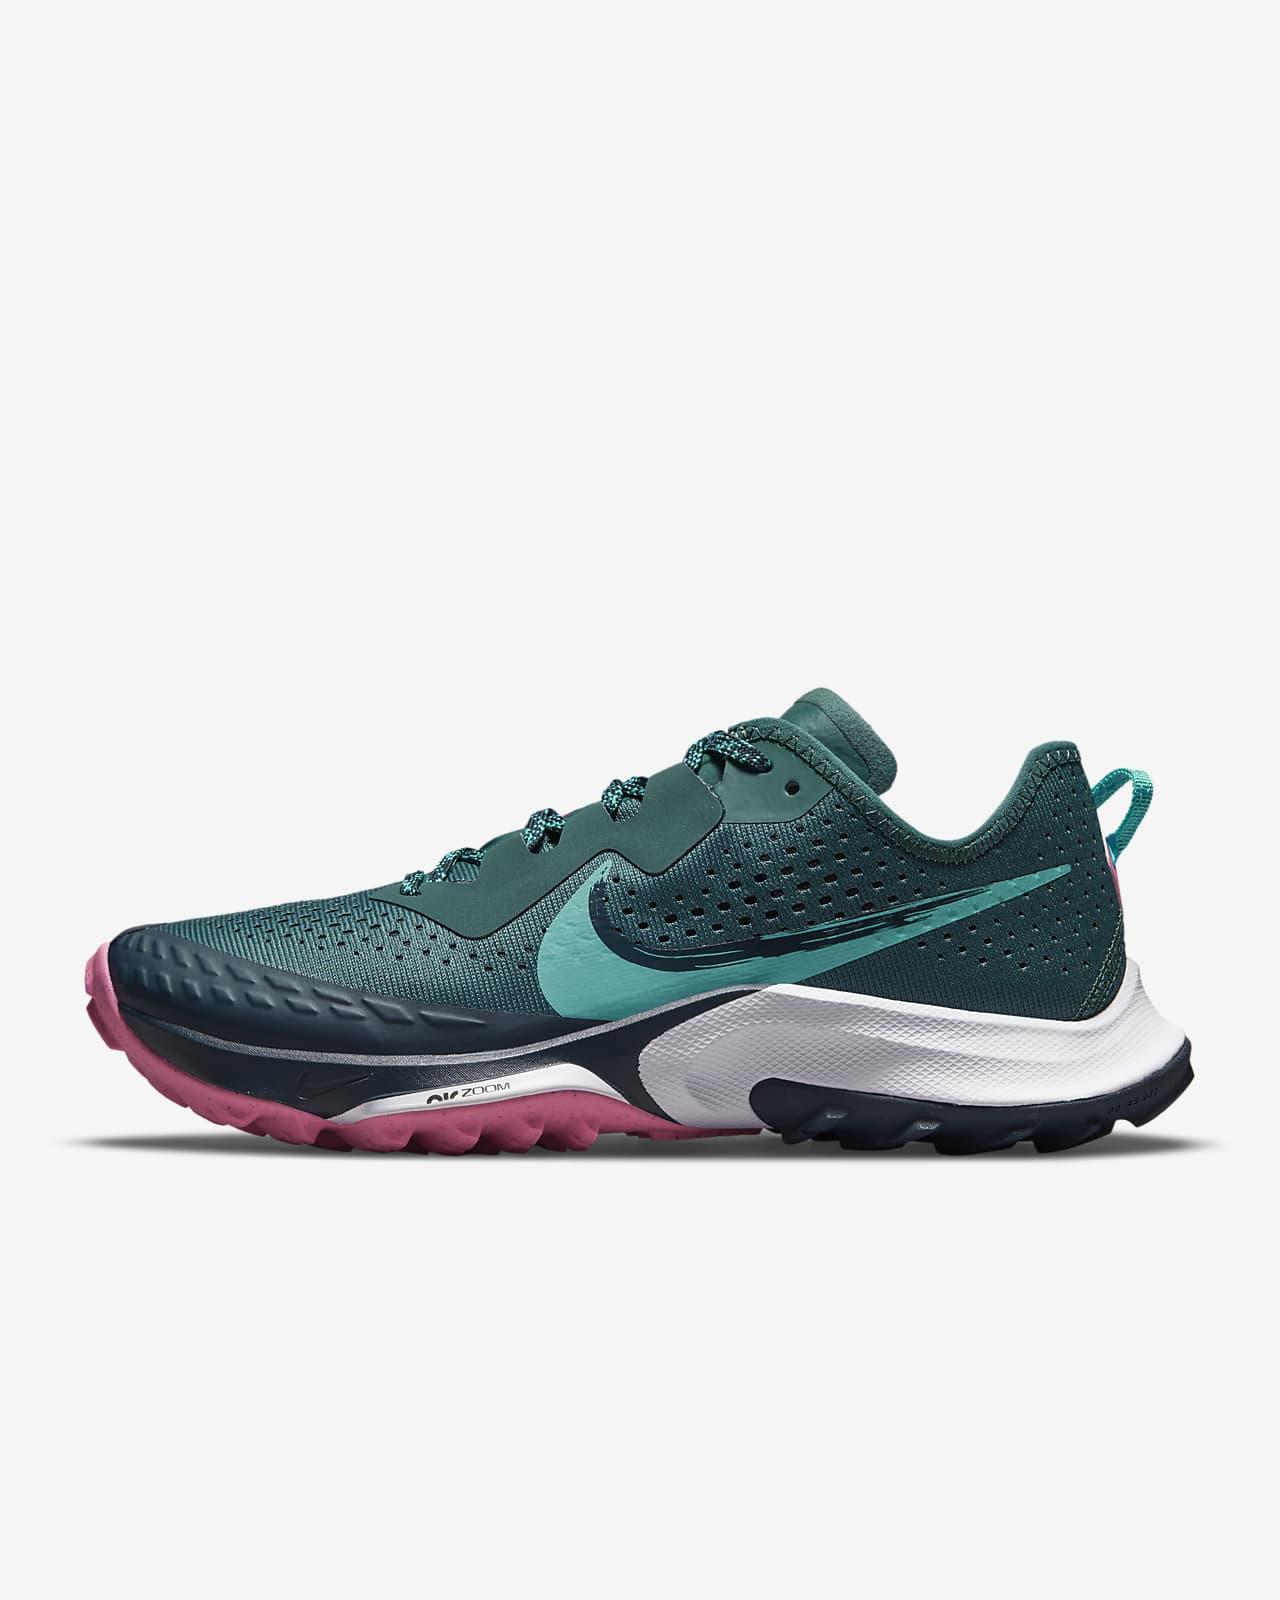 Sapatilhas de running para trilhos Nike Air Zoom Terra Kiger 7 para mulher